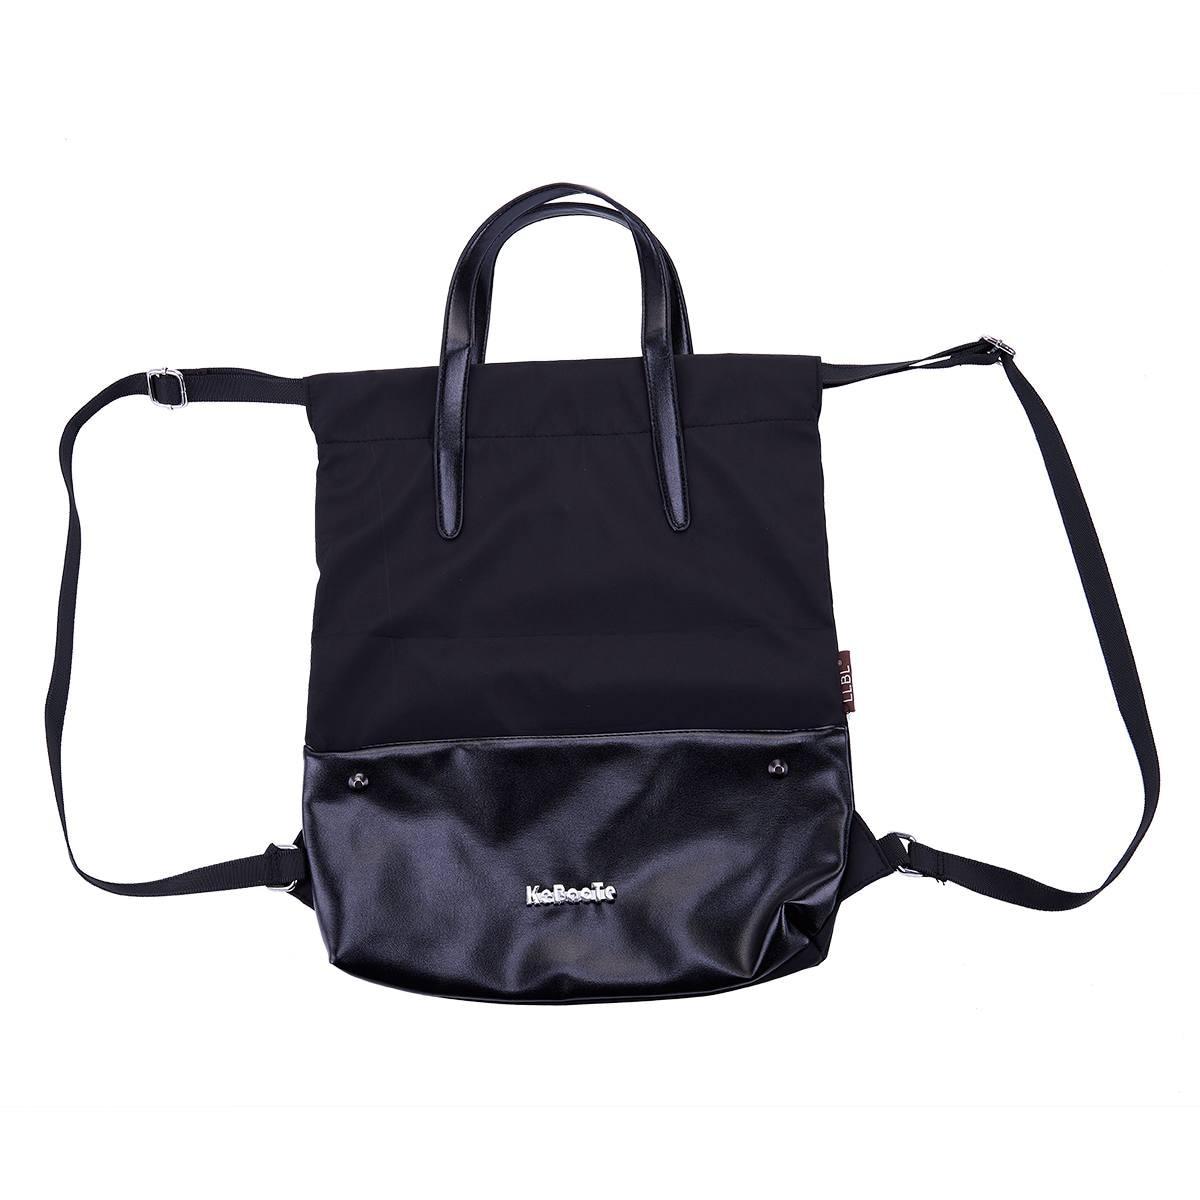 FGGS Drawstring Backpack Sport Gym String Bag Waterproof Sackpack Cinch Sack Gymsack